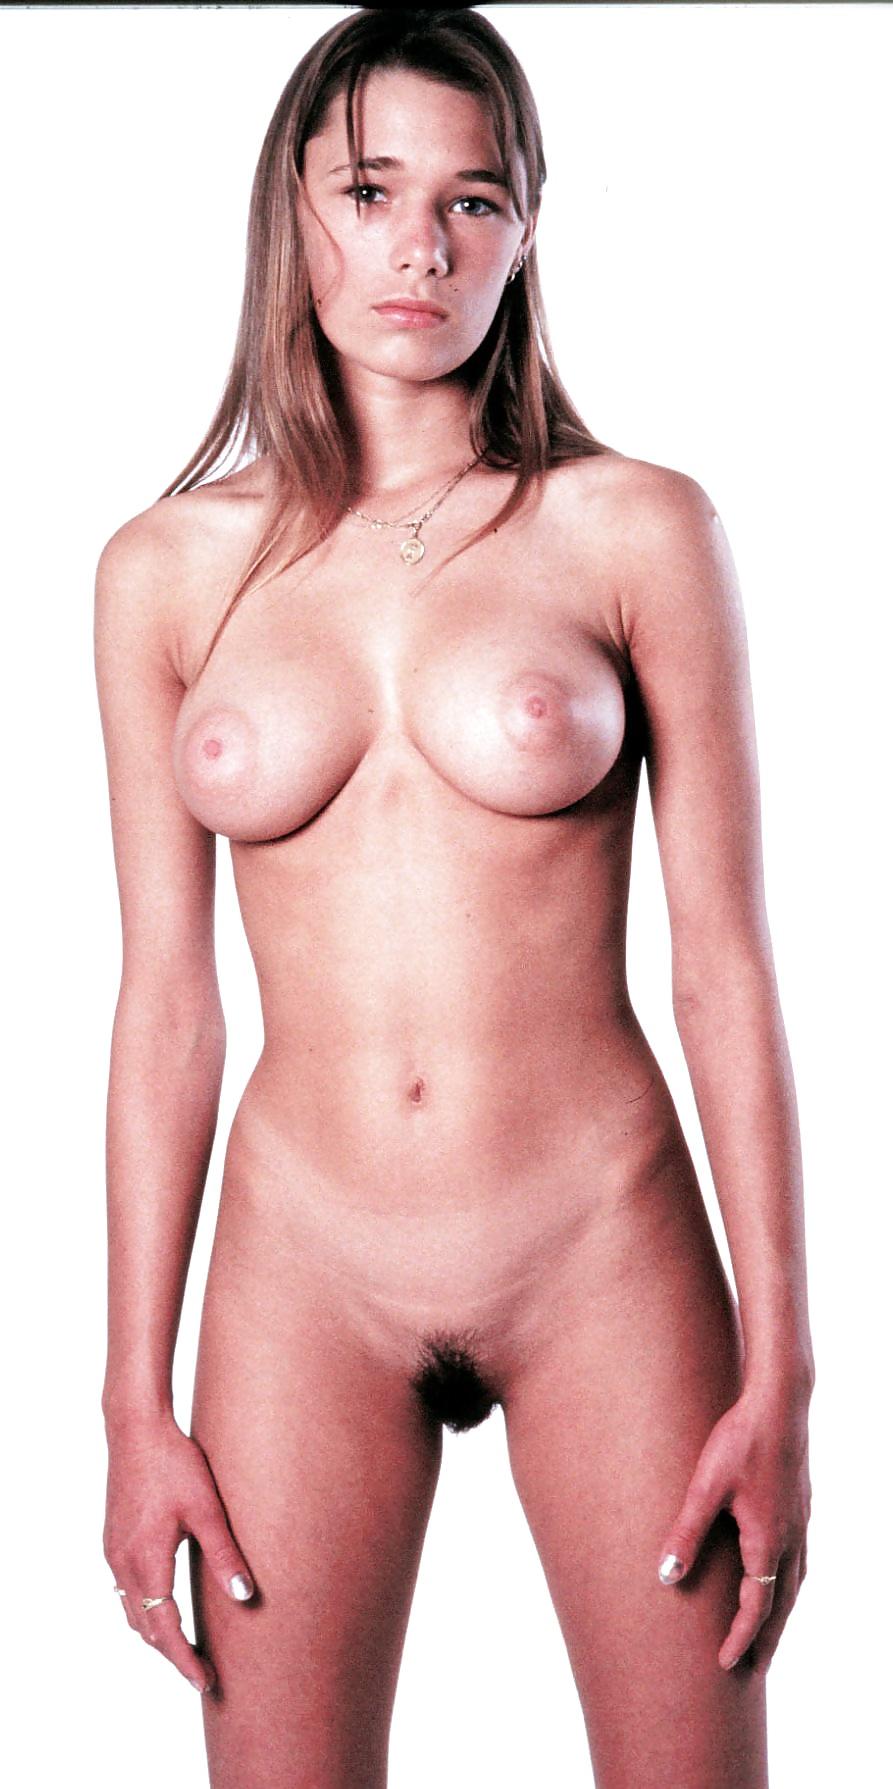 Jennifer garner naked pics, nude employee